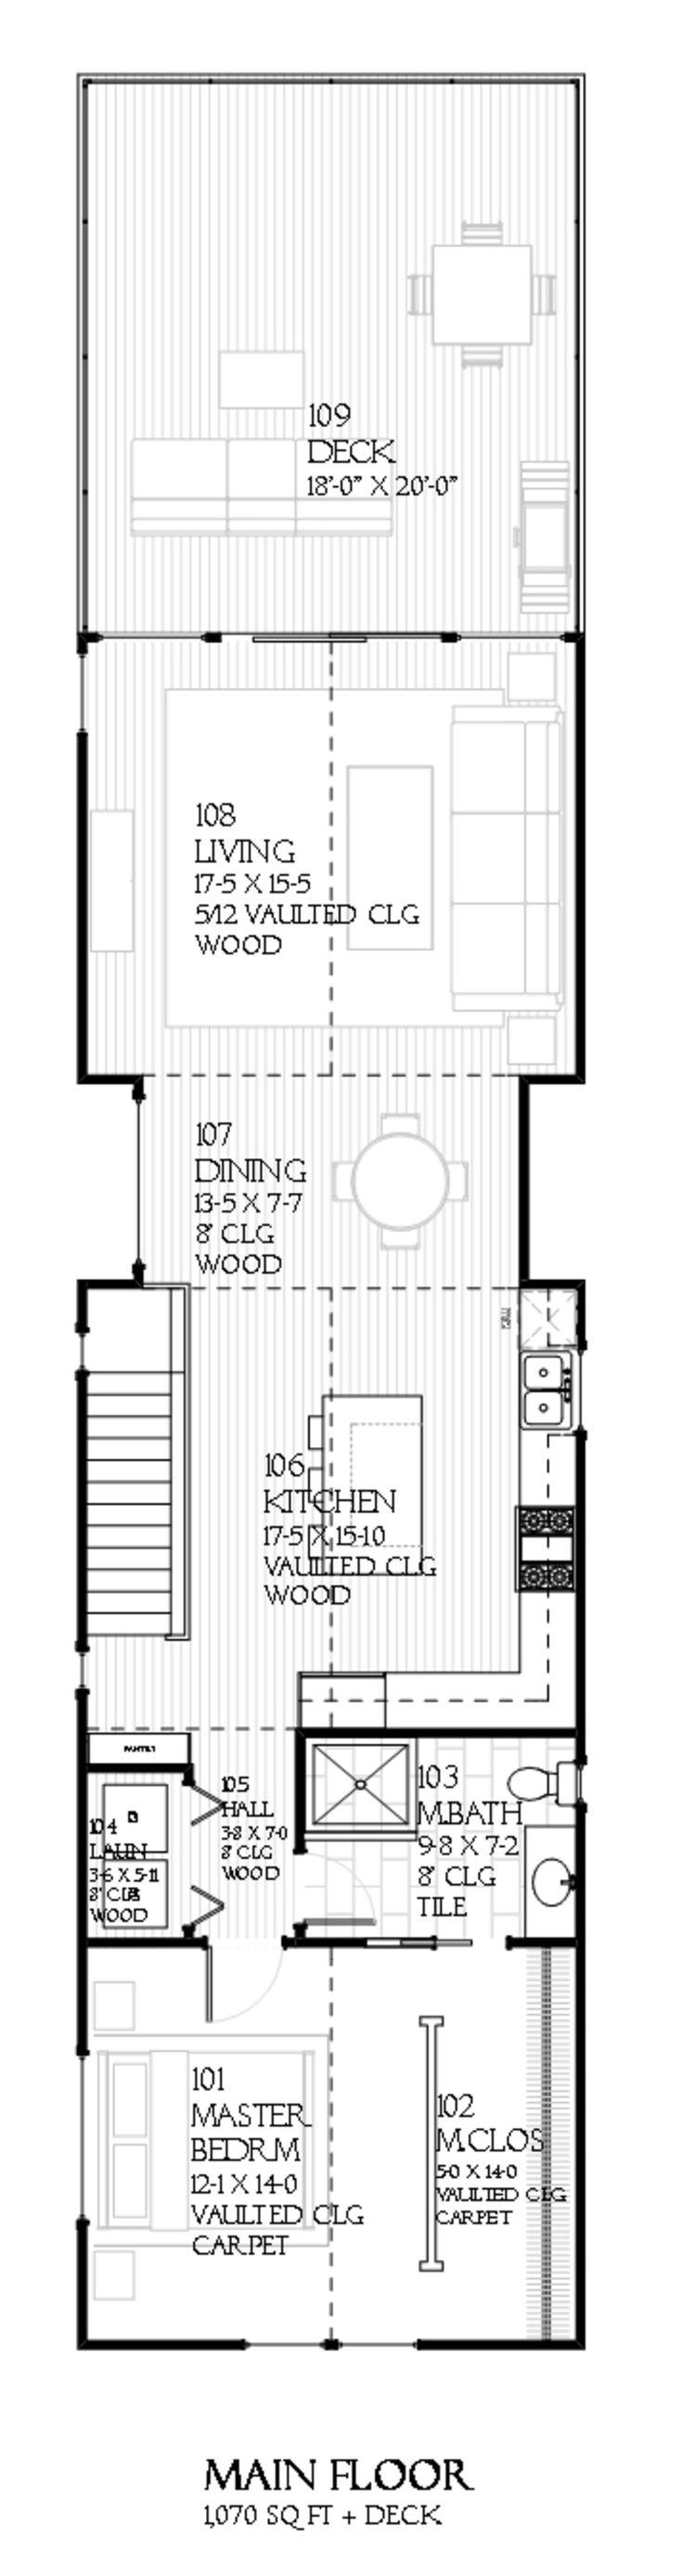 Best Kitchen Gallery: 90 Best 4 Shotgun New Orleans Style Houses Images On Pinterest of Storage Container Shotgun Home Plans on rachelxblog.com